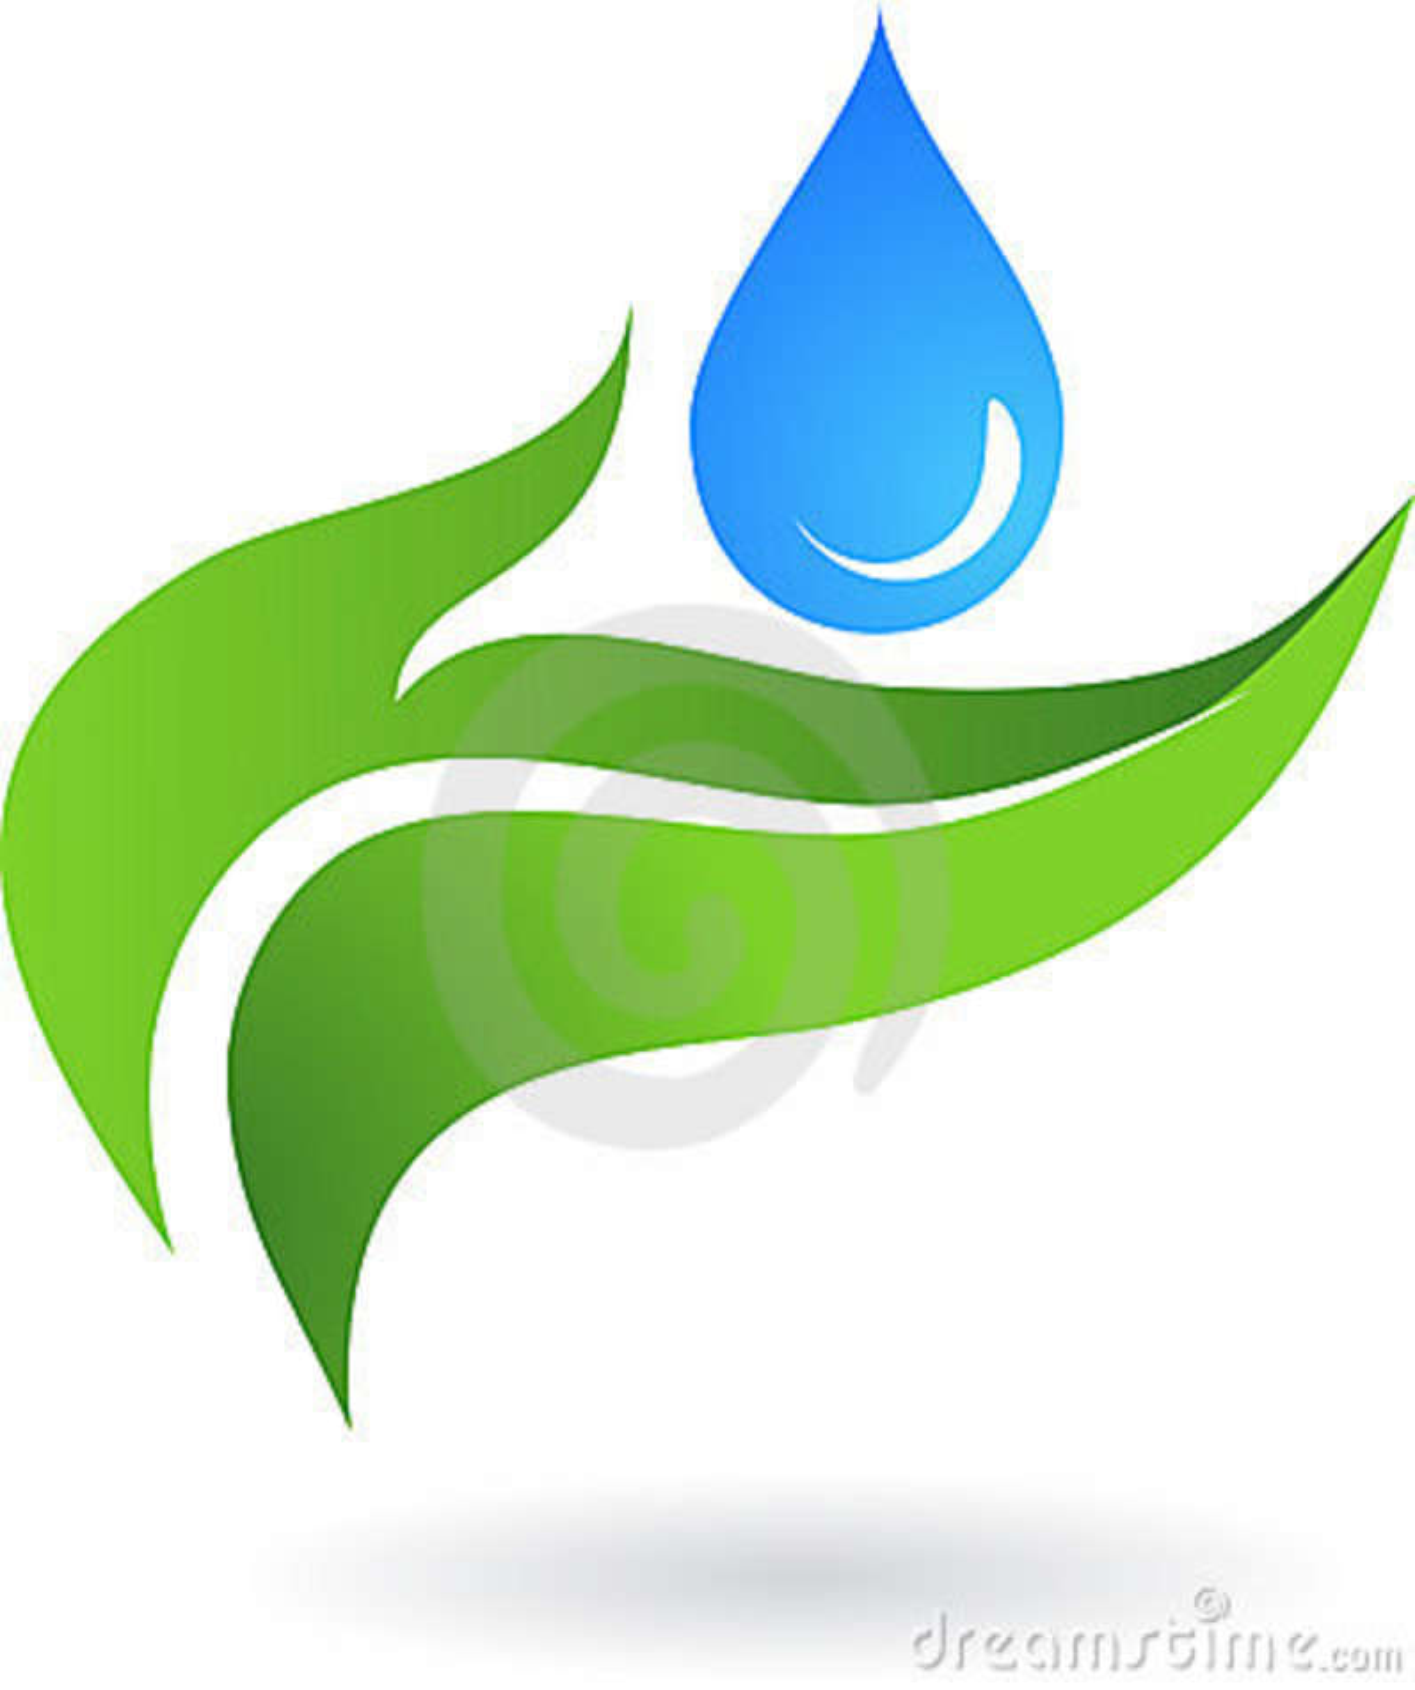 download branded component strategies ingredient branding in